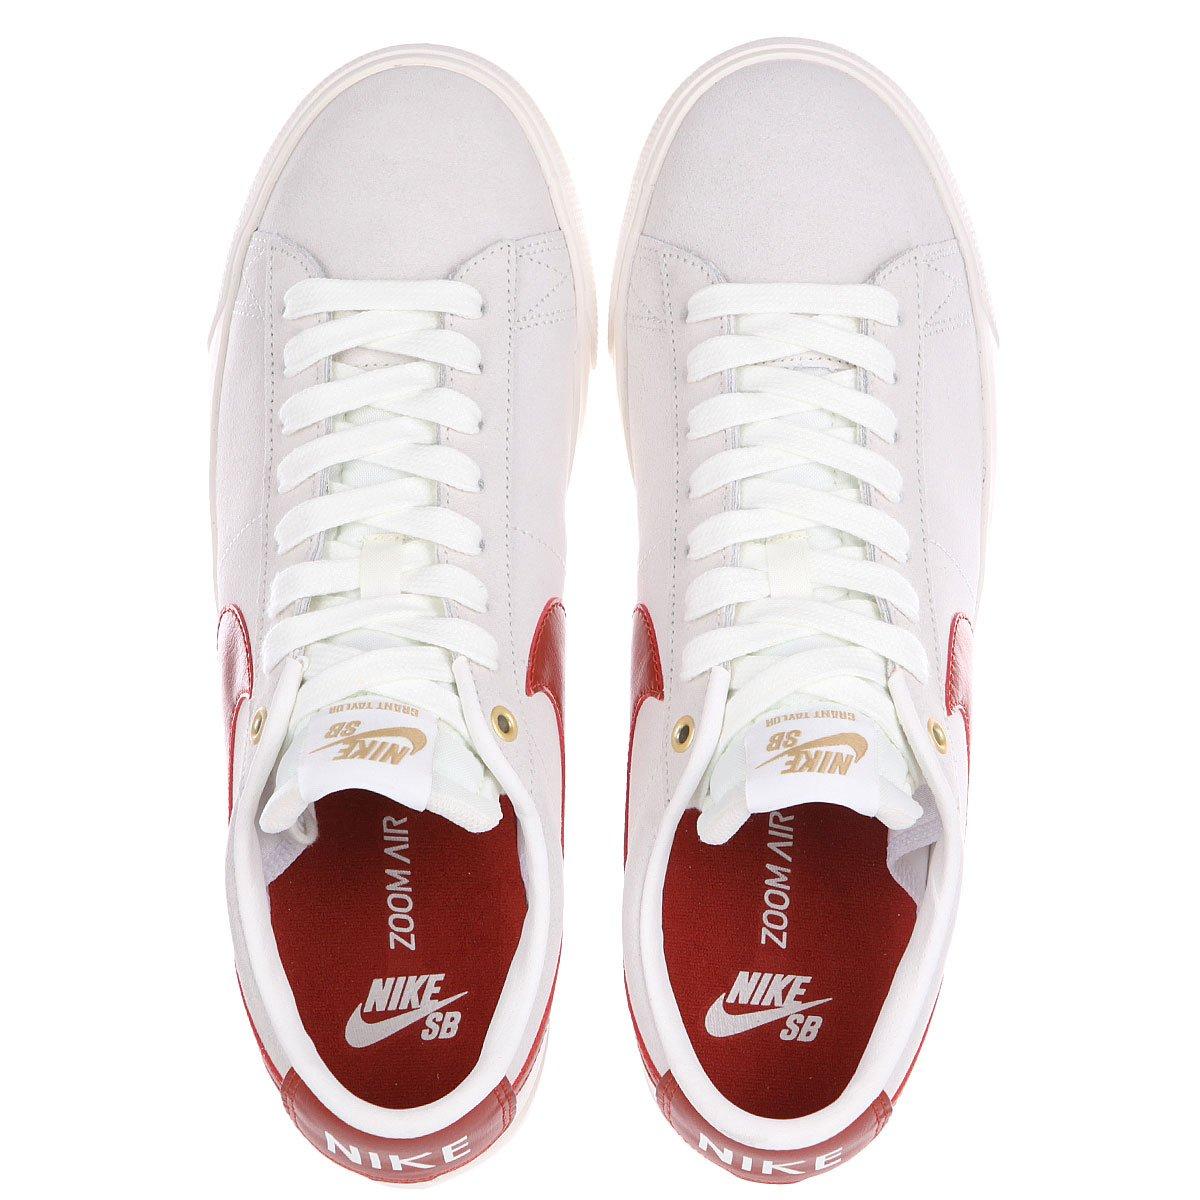 3c2d7b87250b Купить кеды низкие Nike Blazer Low Gt Ivory Cinnabar Metallic Gold ...